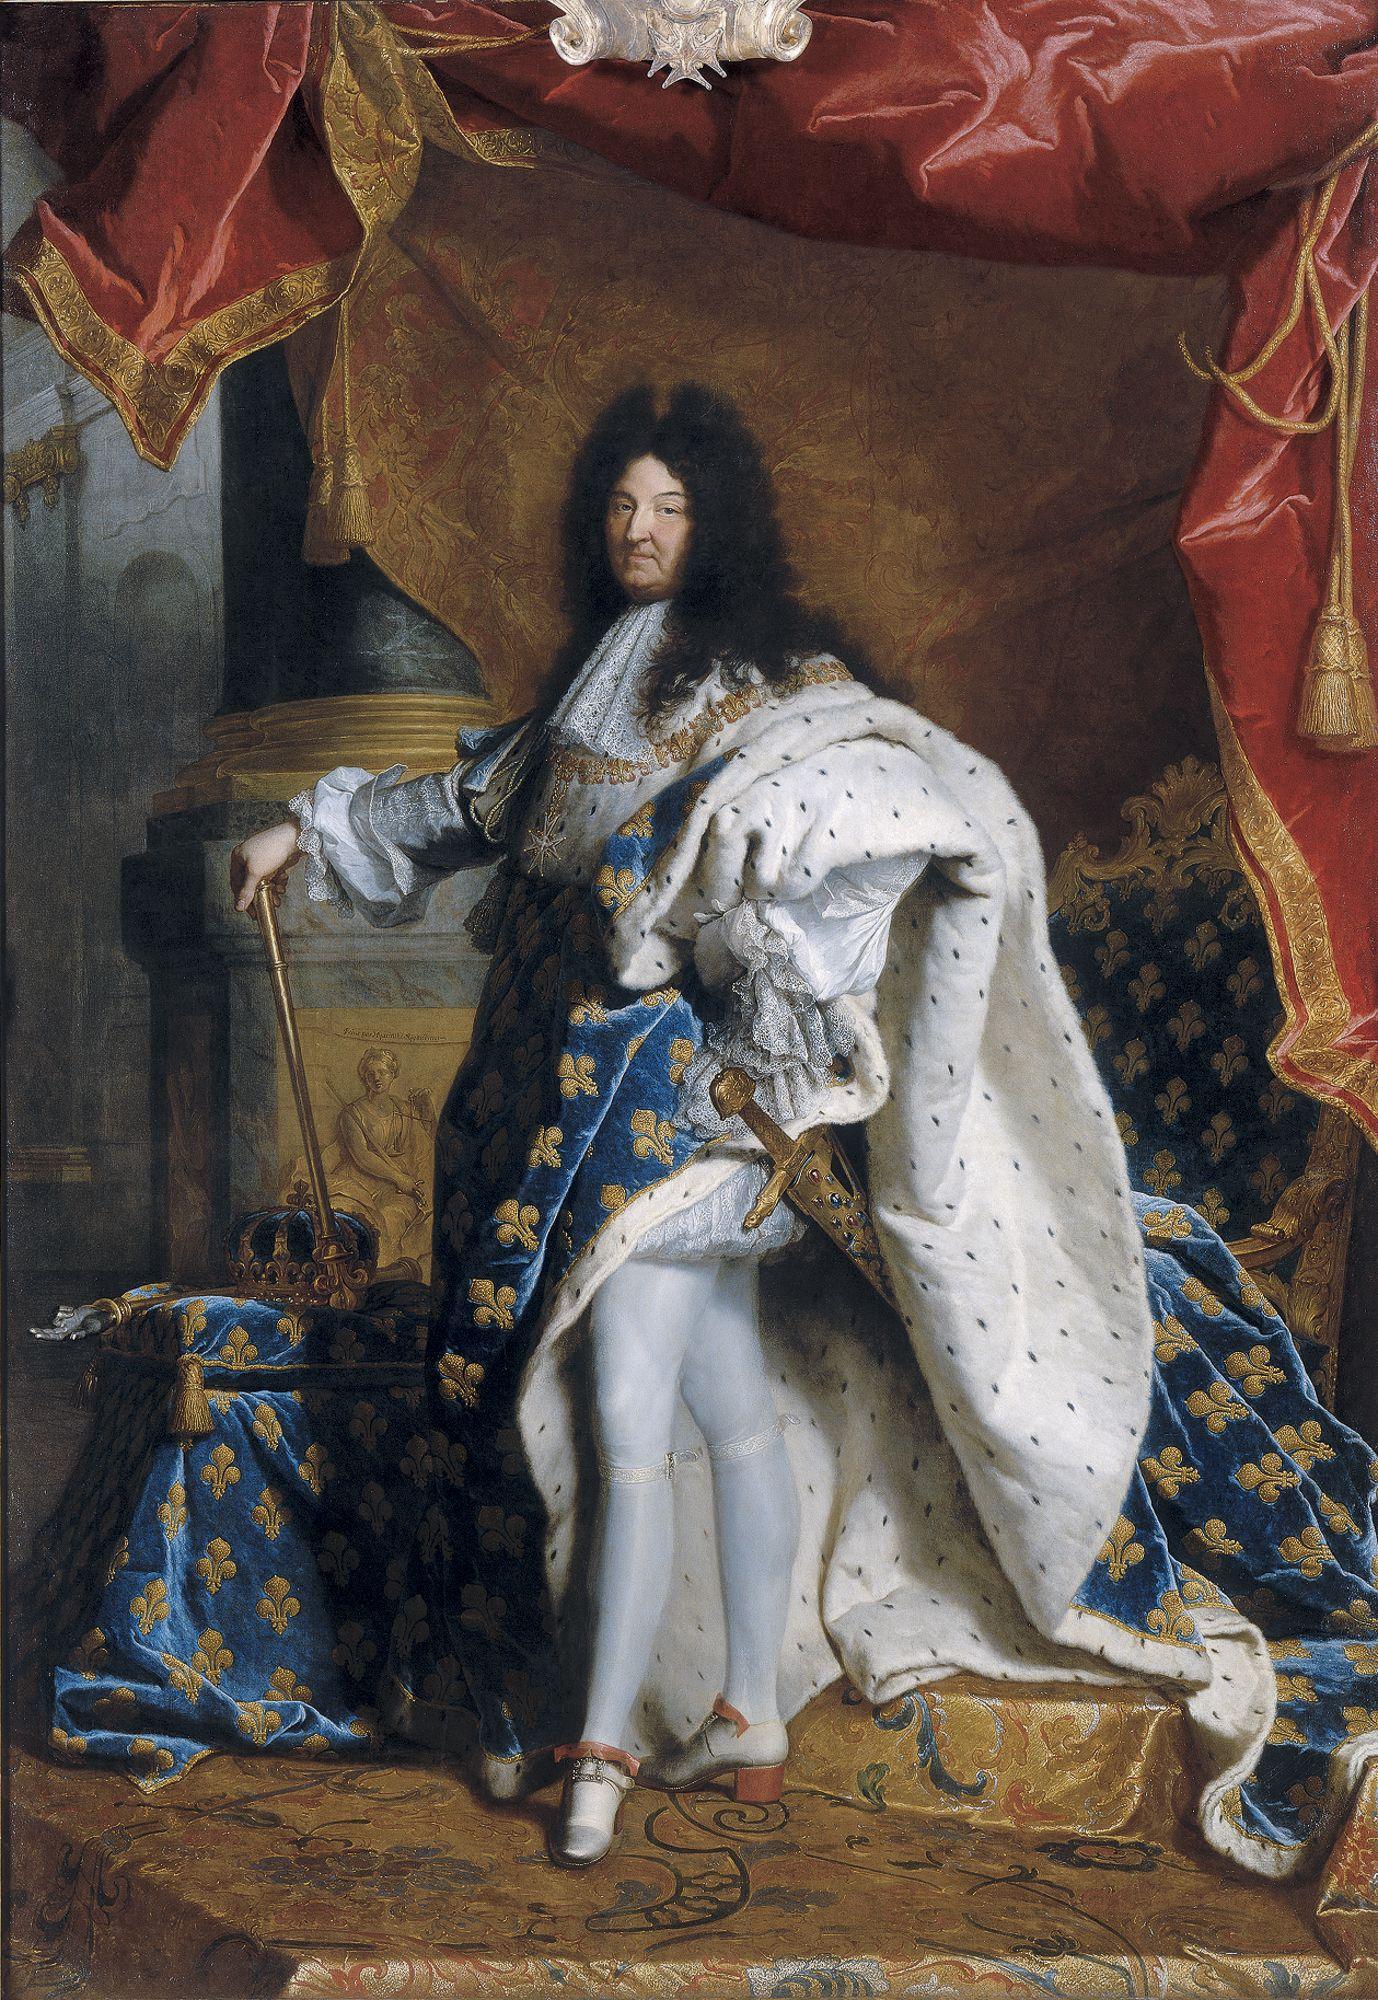 tableau Louis XIV Hyacinthe Rigaud